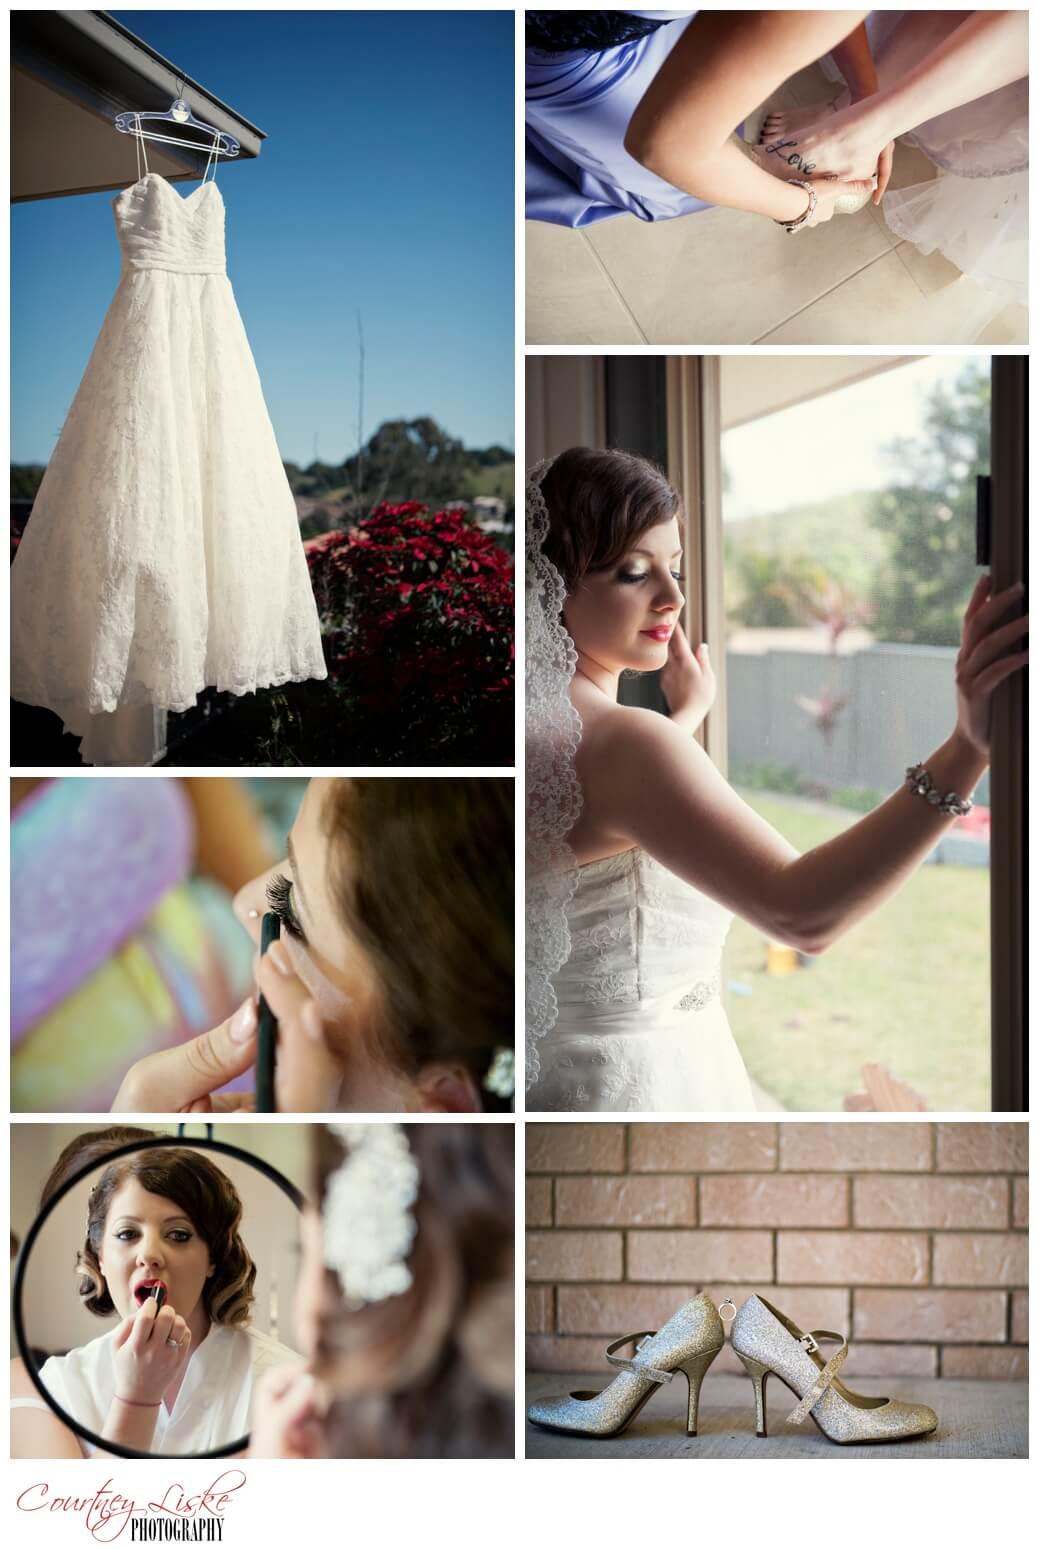 Carlen & Amy - Regina Wedding Photographer - Courtney Liske Photography